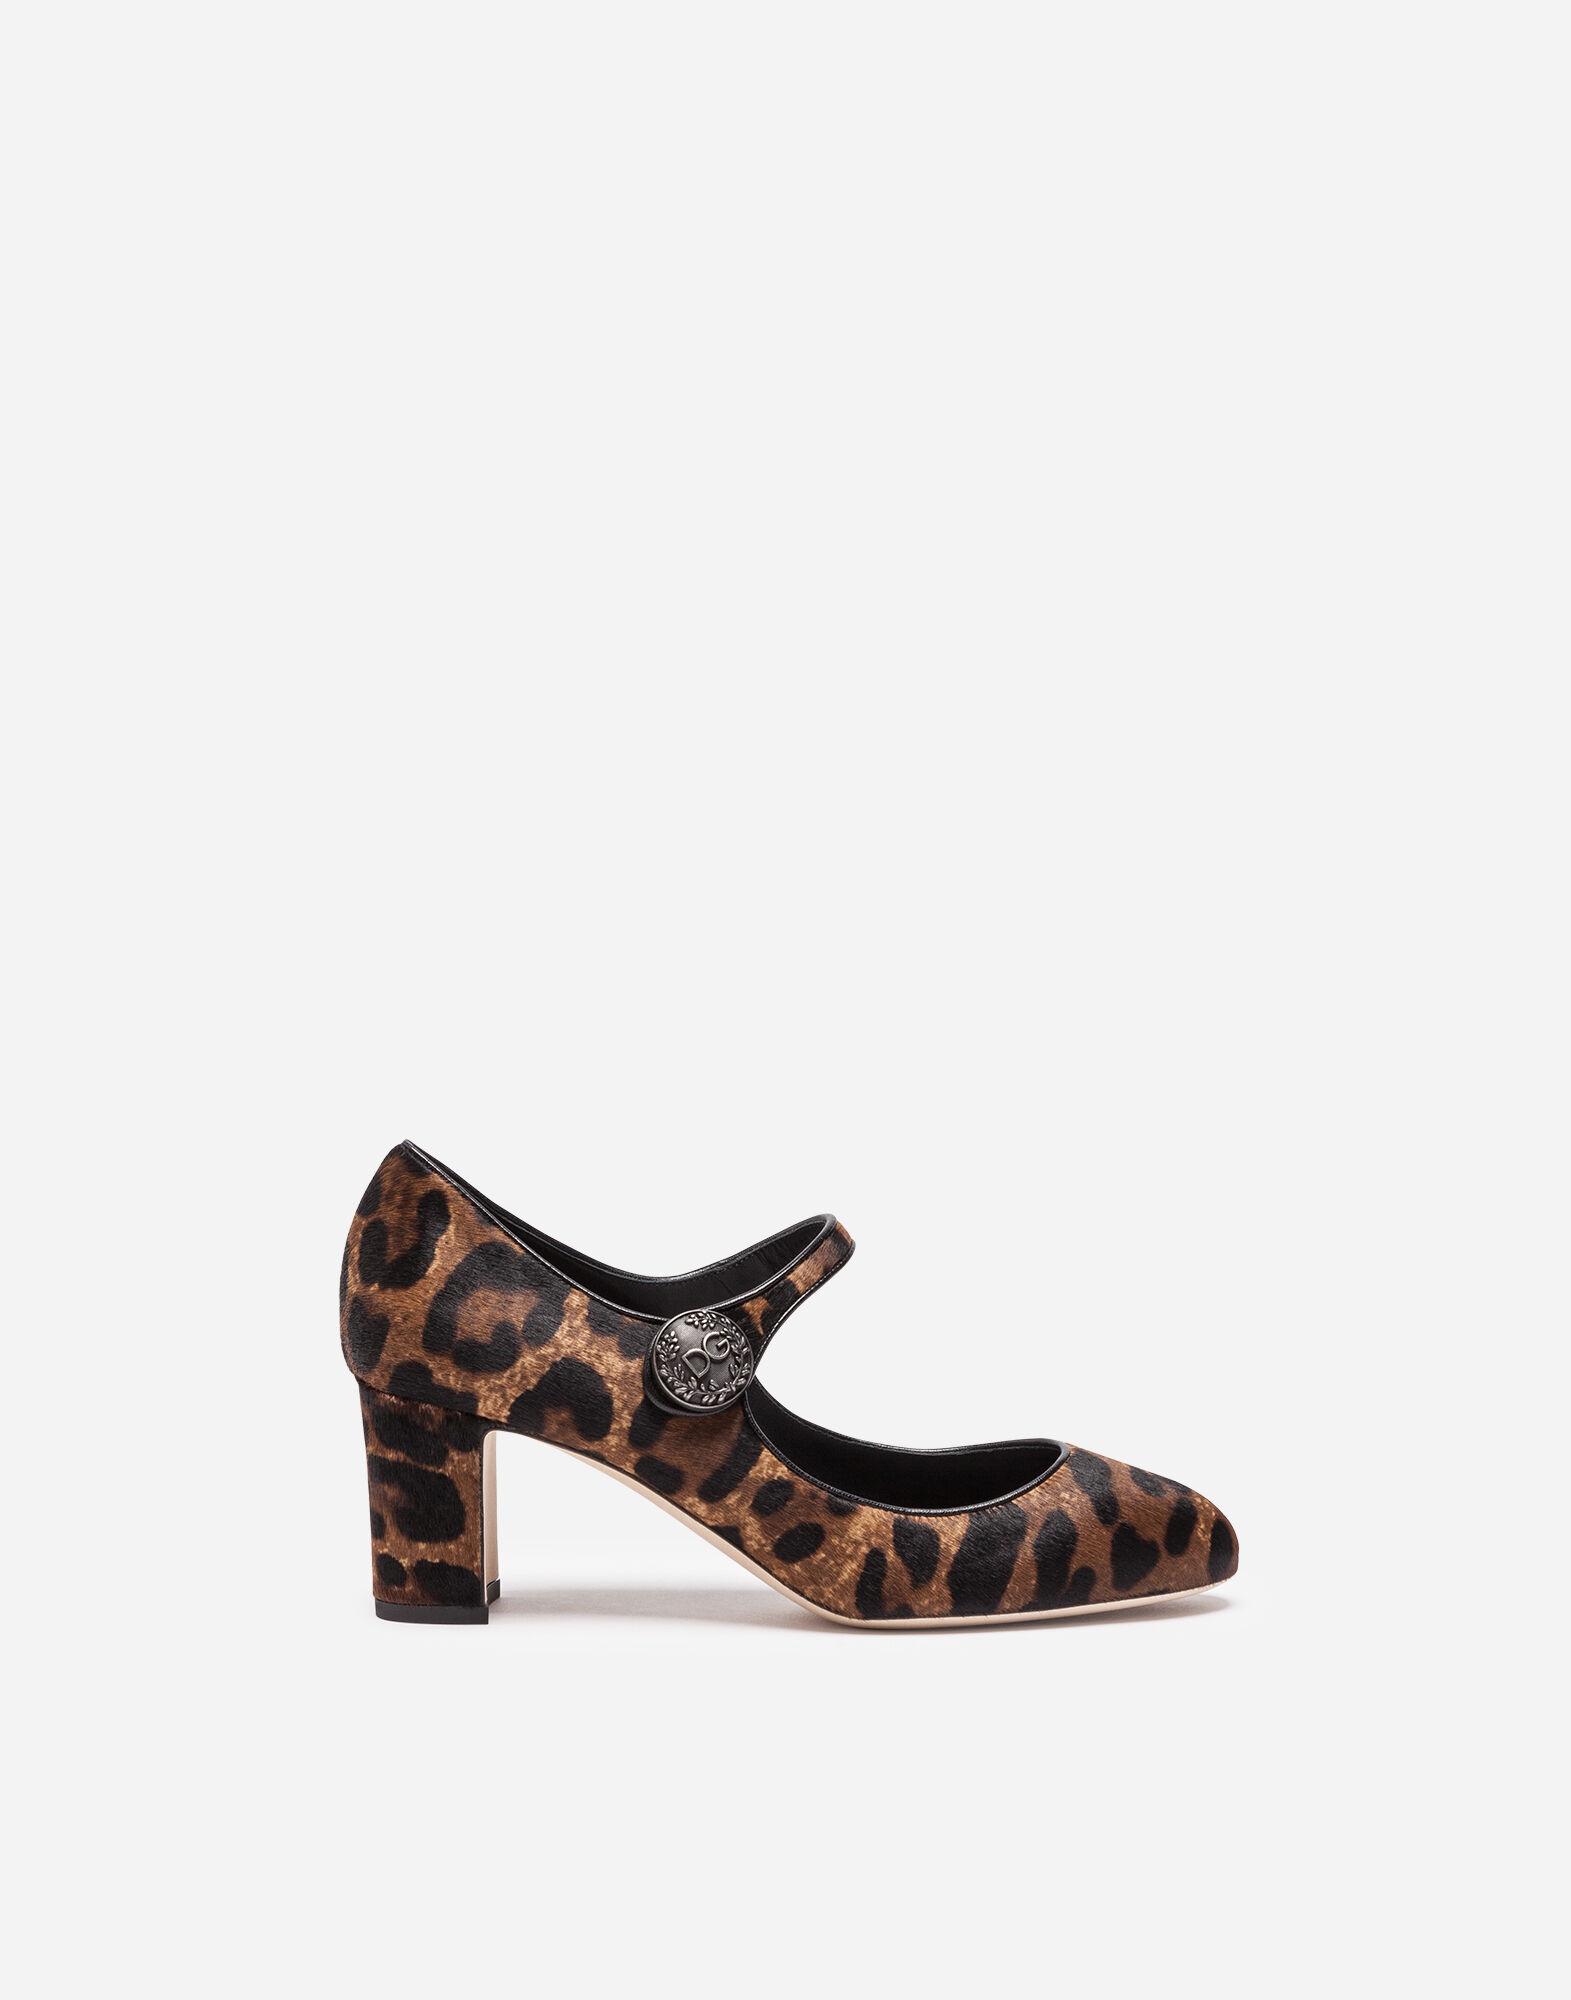 Costo de envío gratis Fechas de lanzamiento de venta Now Zapatos CAPANA para mujer 1OgwtMEma